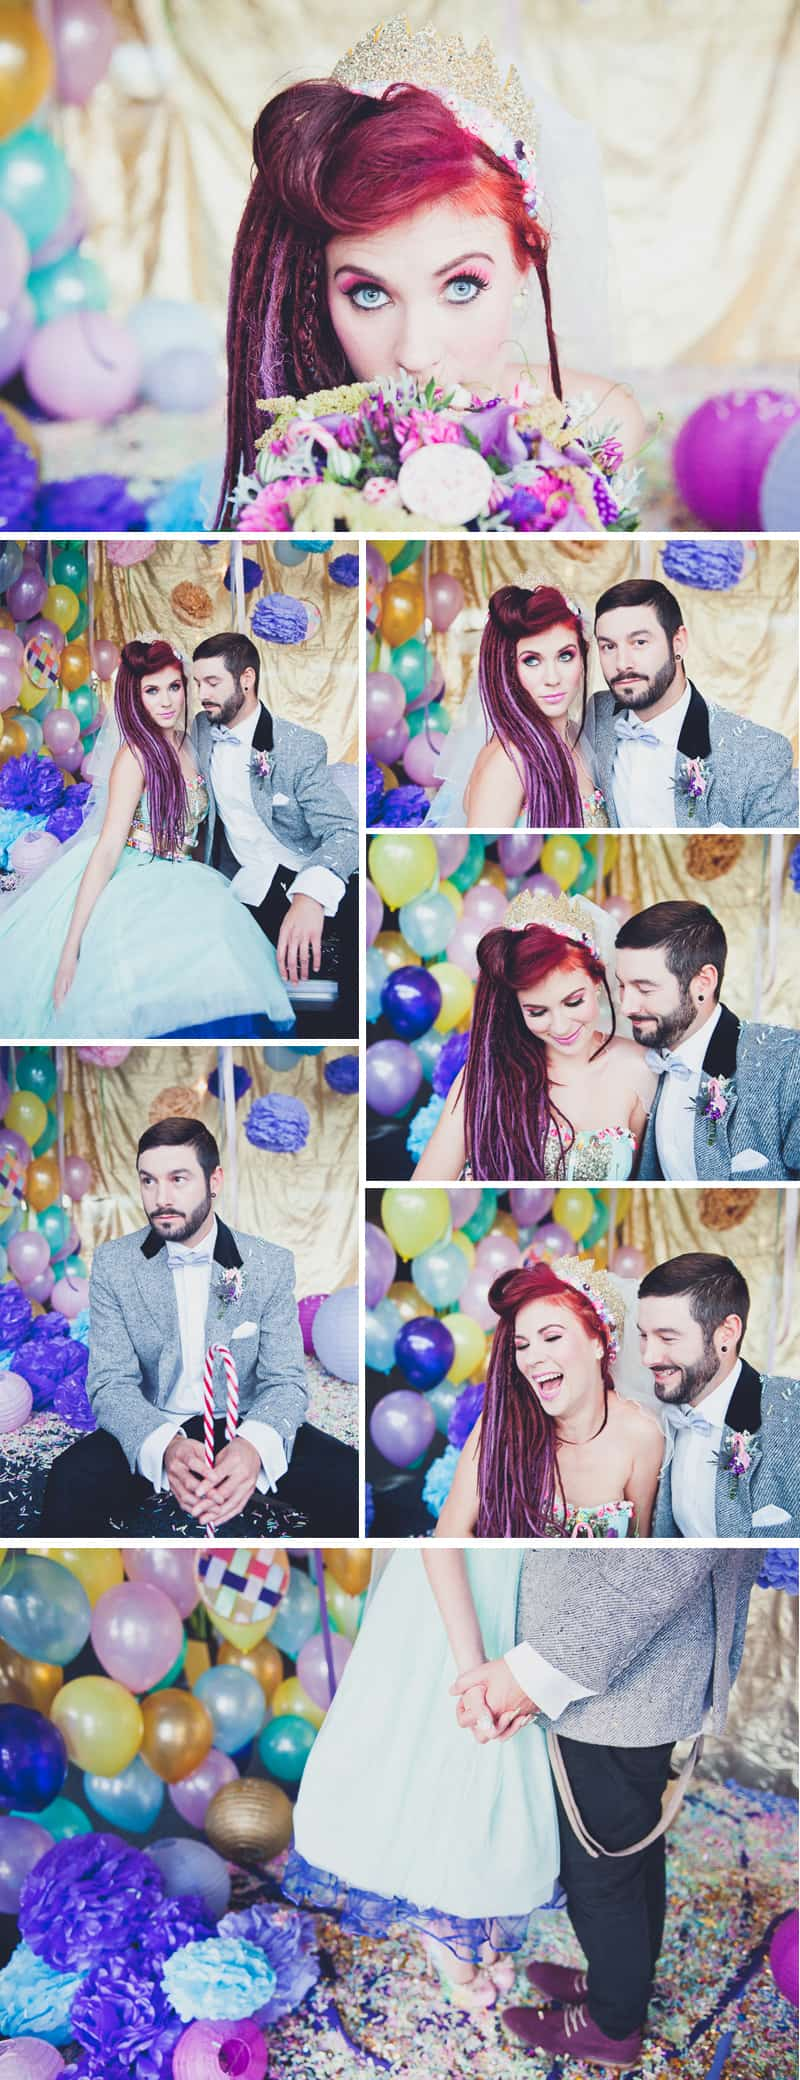 Willy Wonka Weird Wonderful Wedding World 2